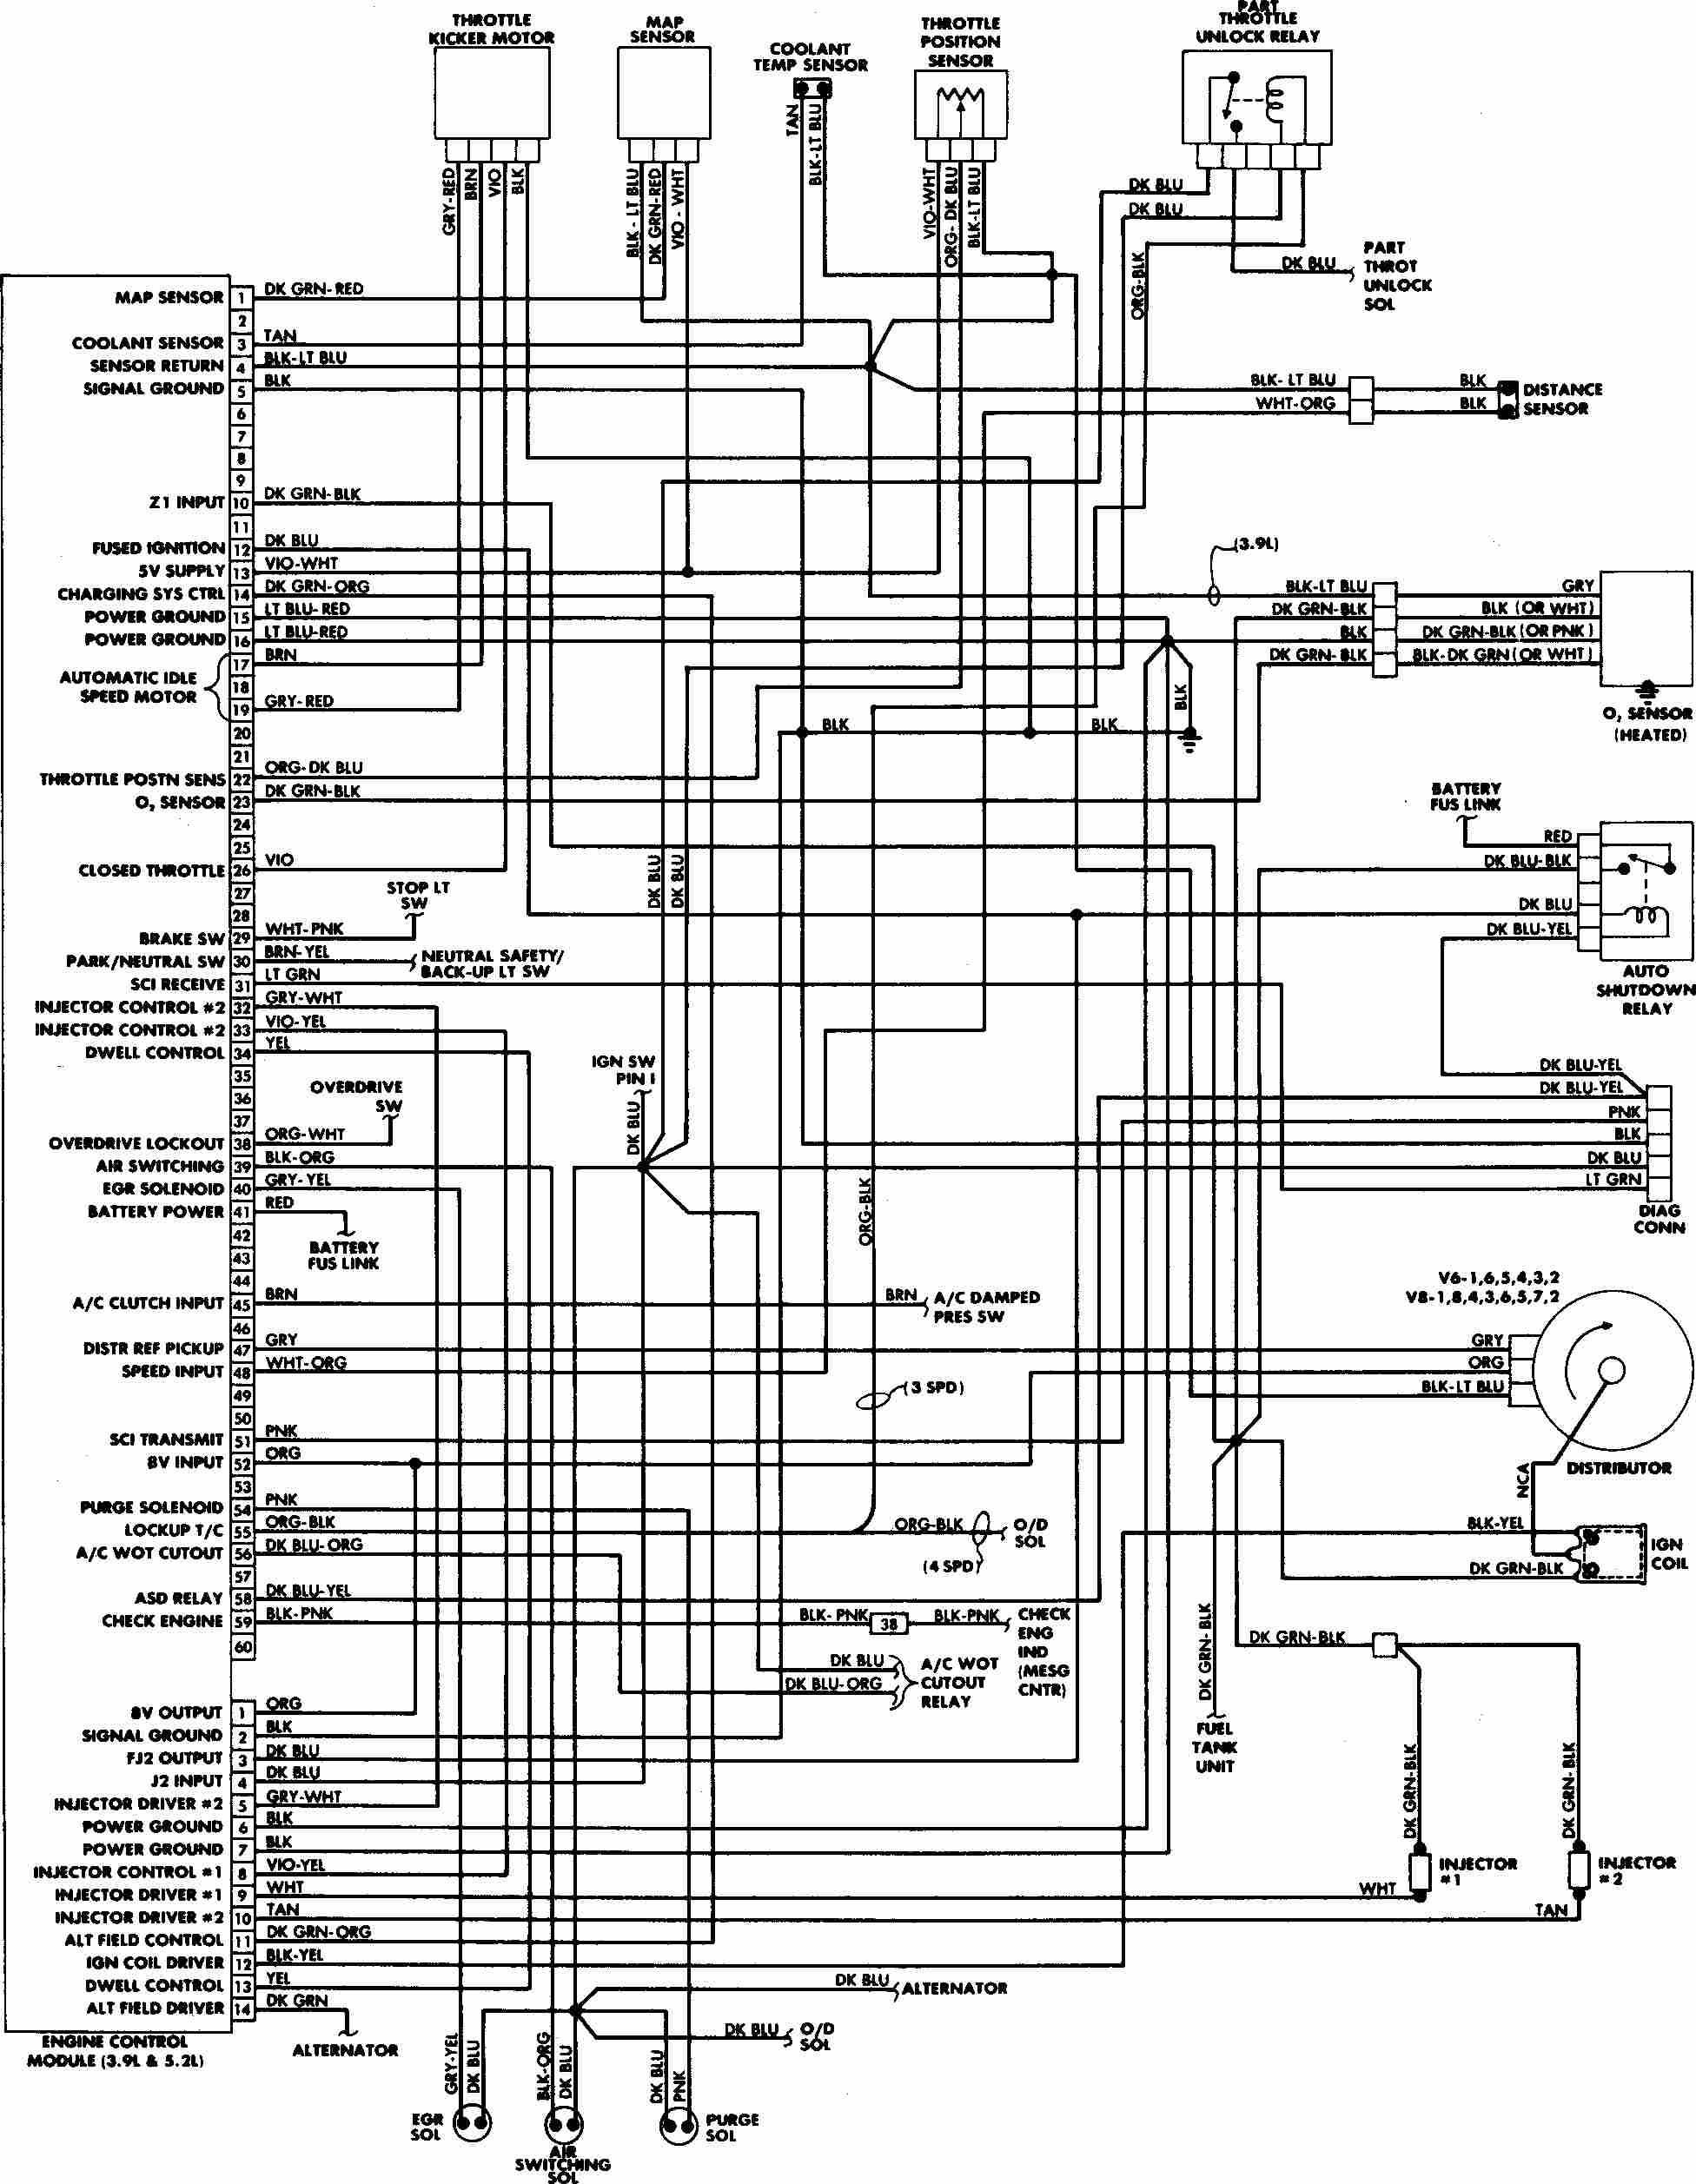 2010 dodge ram wiring diagram